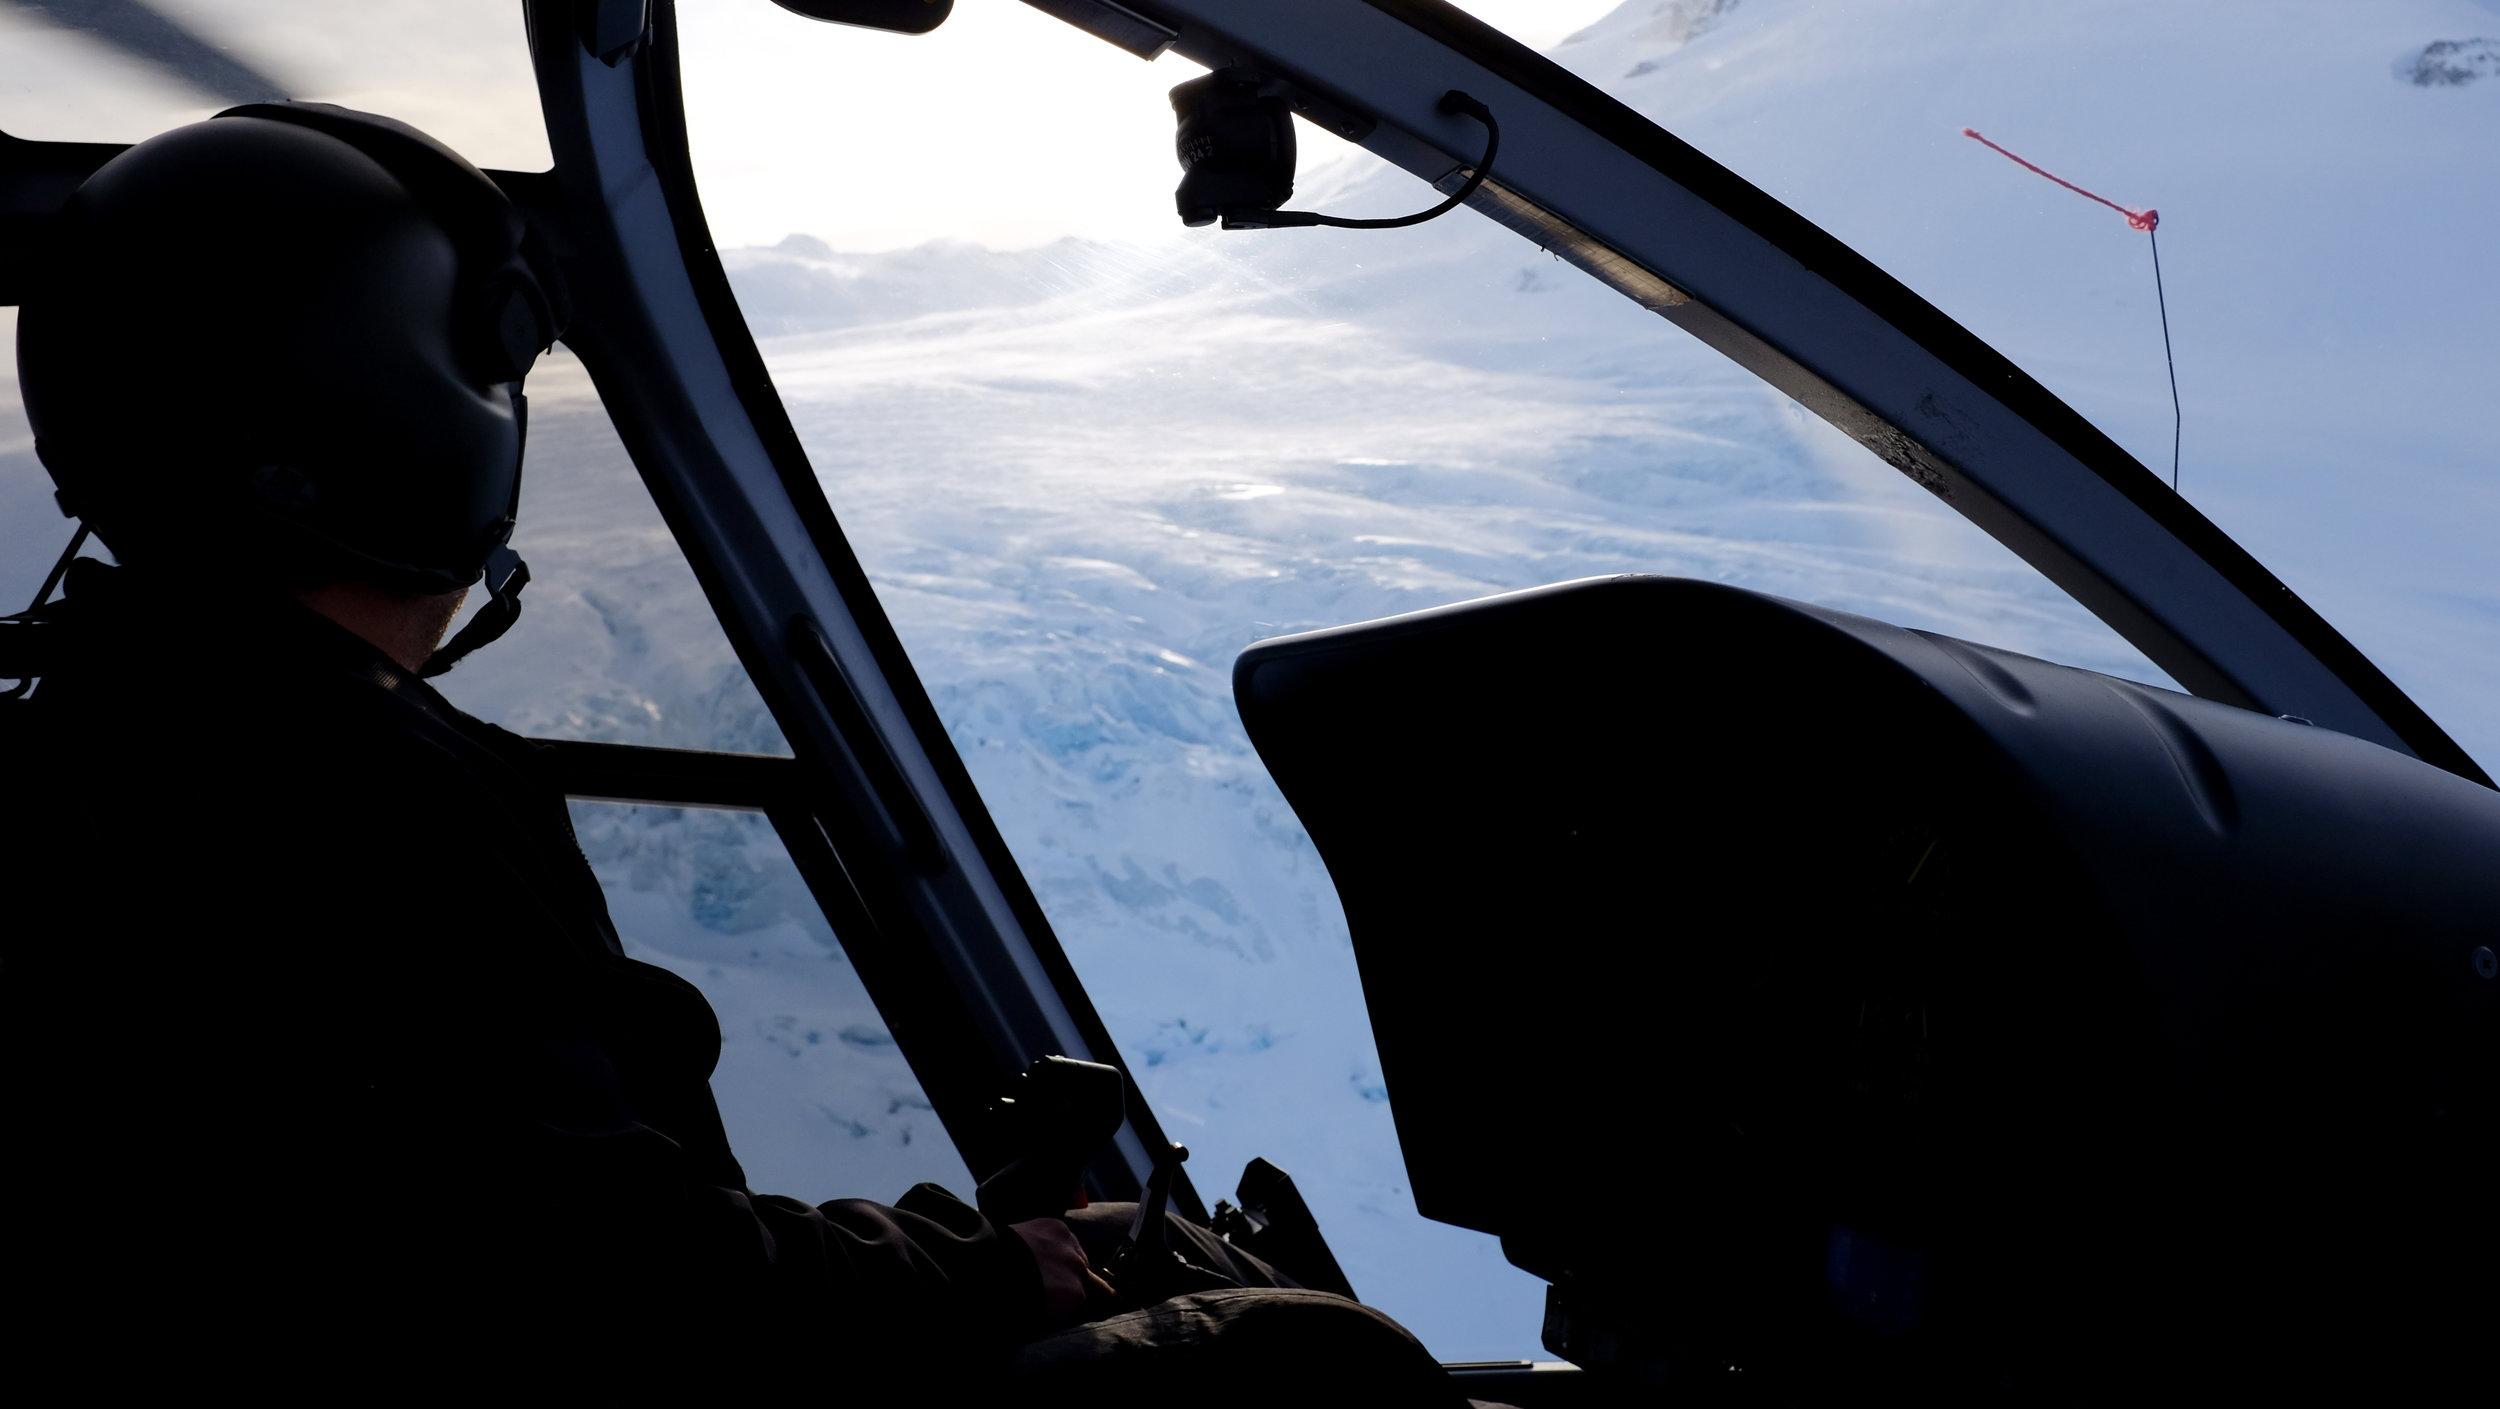 Glacier via Helicopter | Whistler, BC, Canada